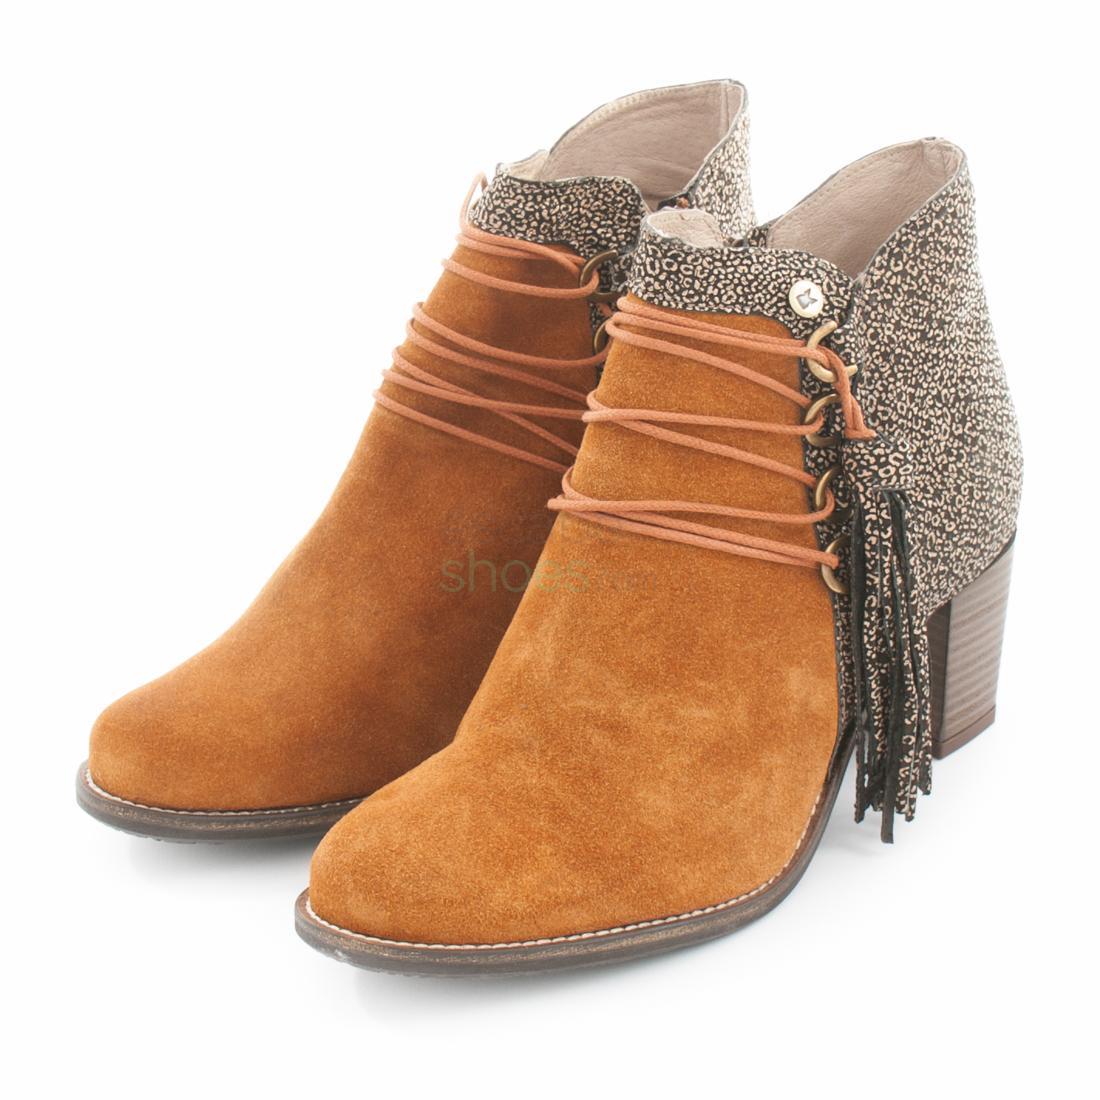 bcafa3be Footwear / Ankle Boots · Botins DKODE Clock Caprice Cognac FW1712876 033